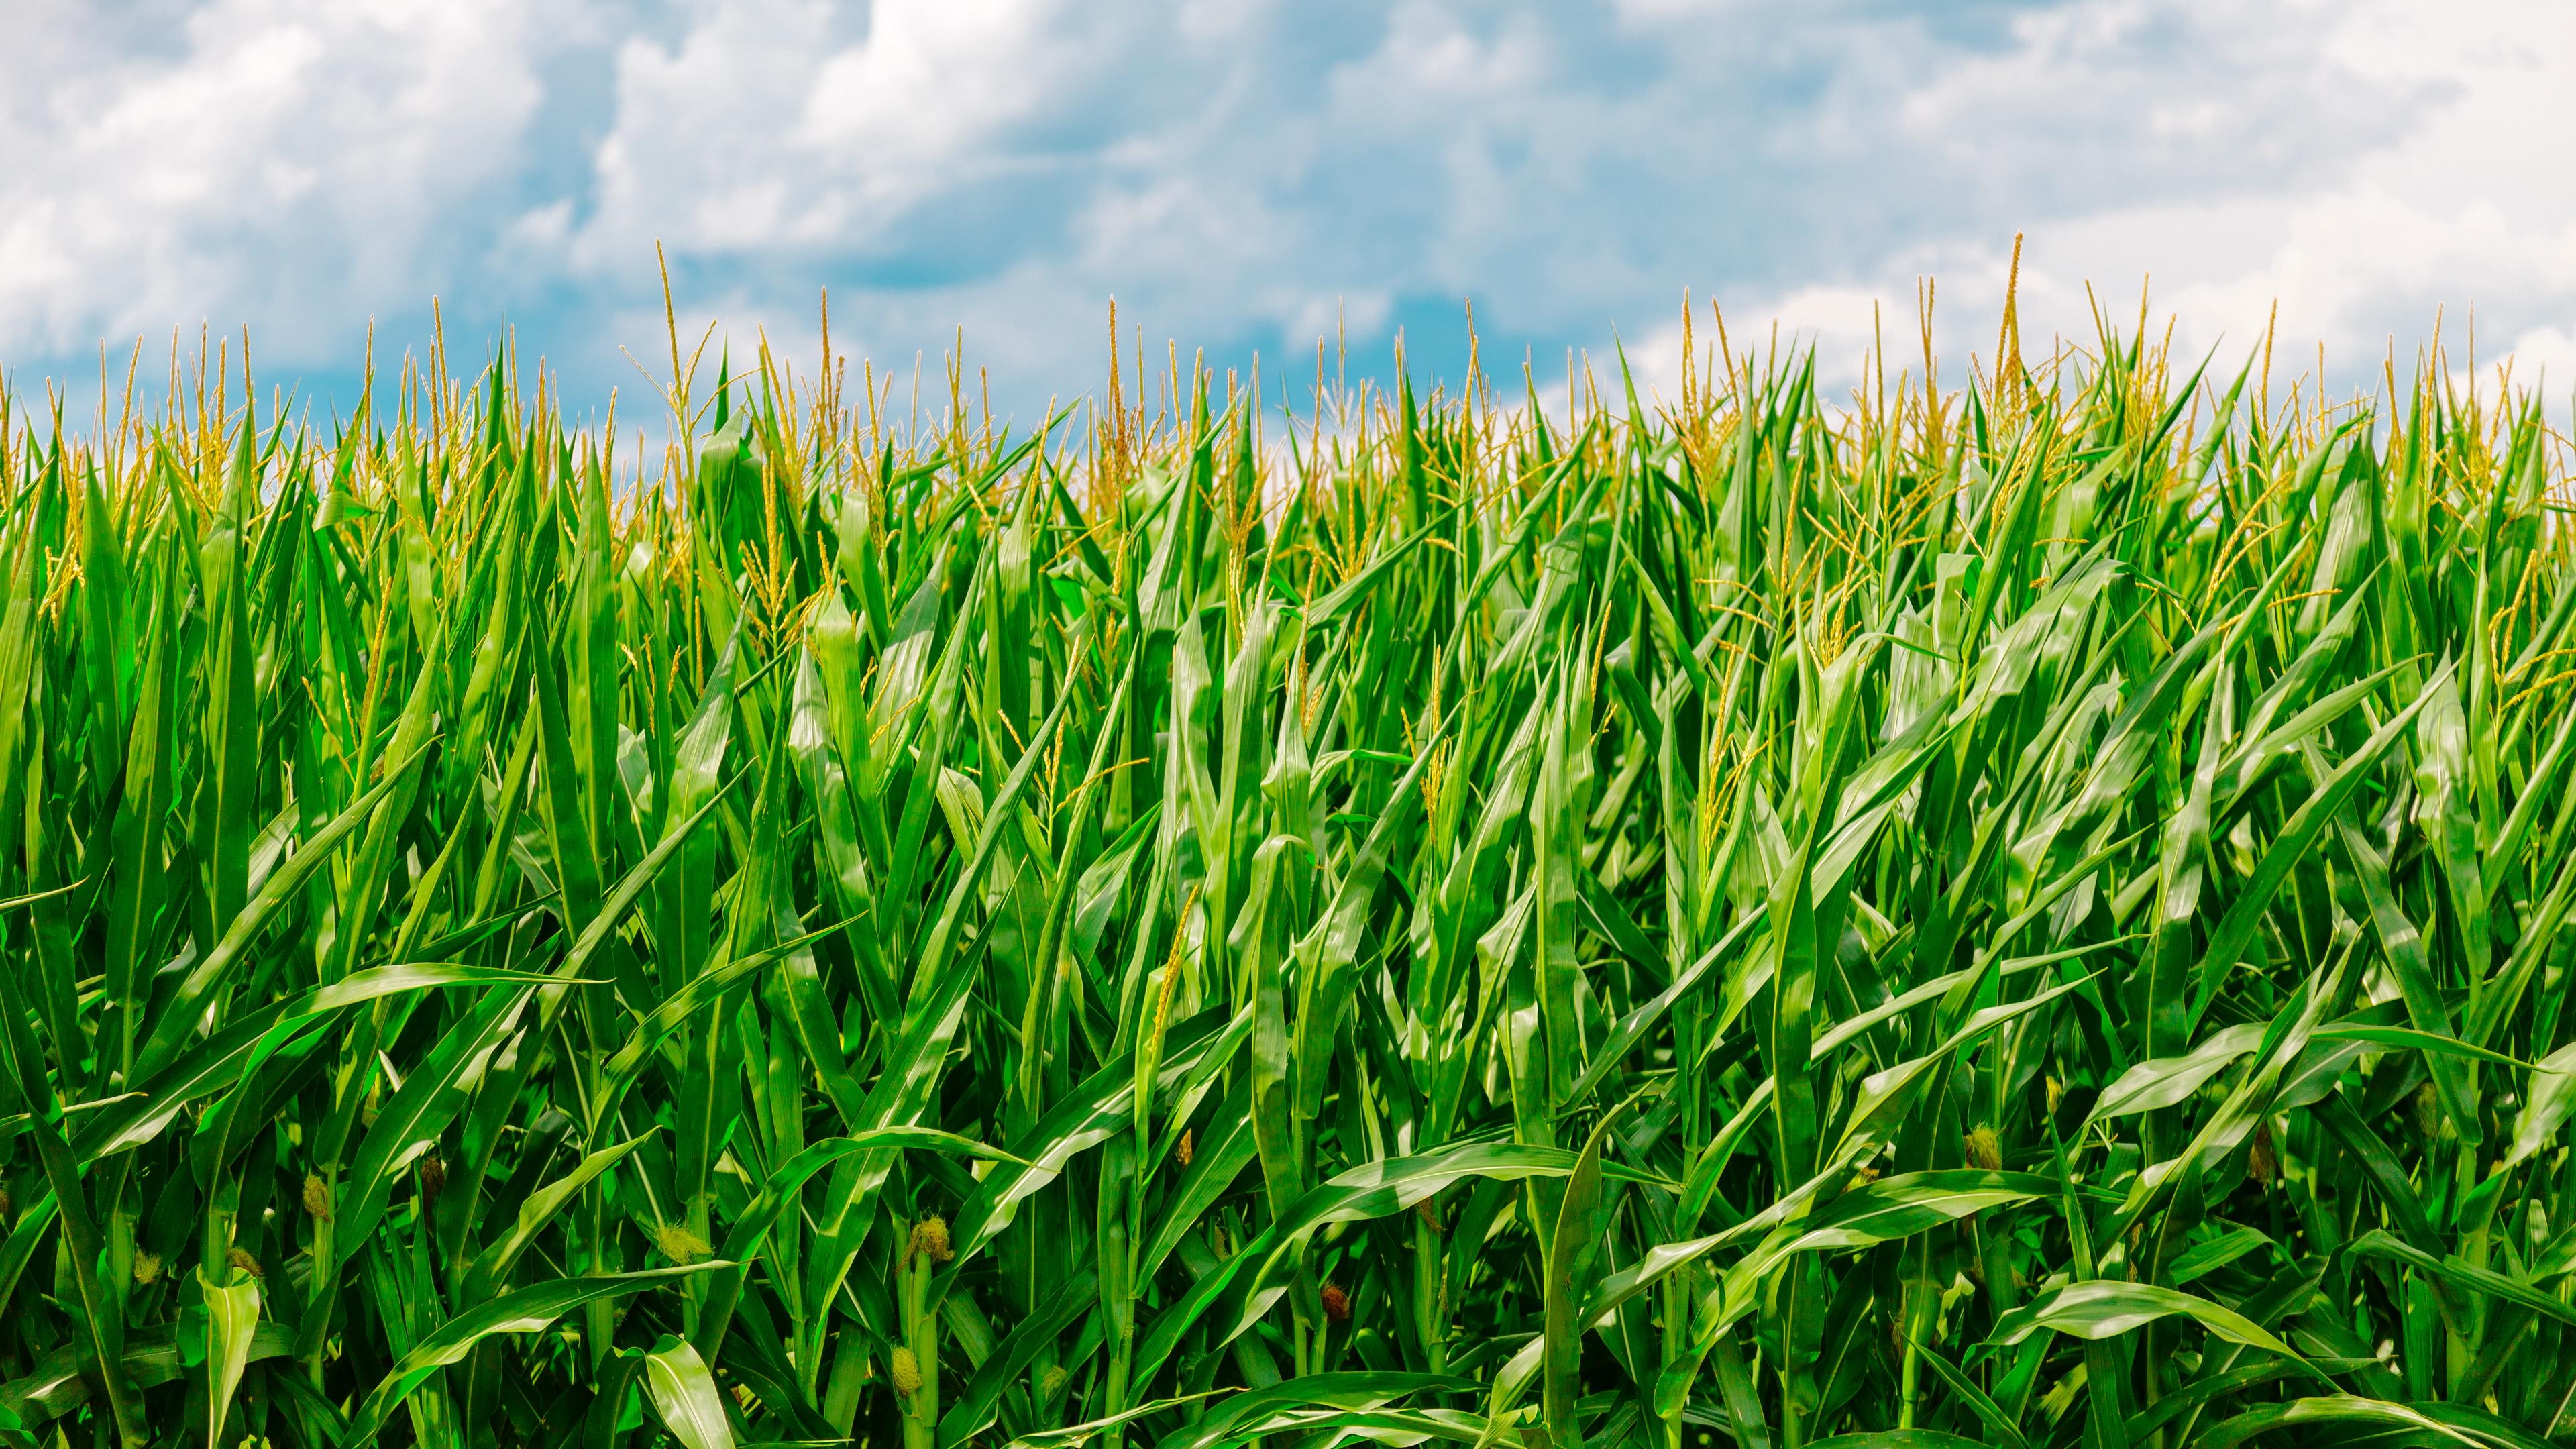 corn field summer farm 4k 1541117133 - corn, field, summer, farm 4k - Summer, Field, corn